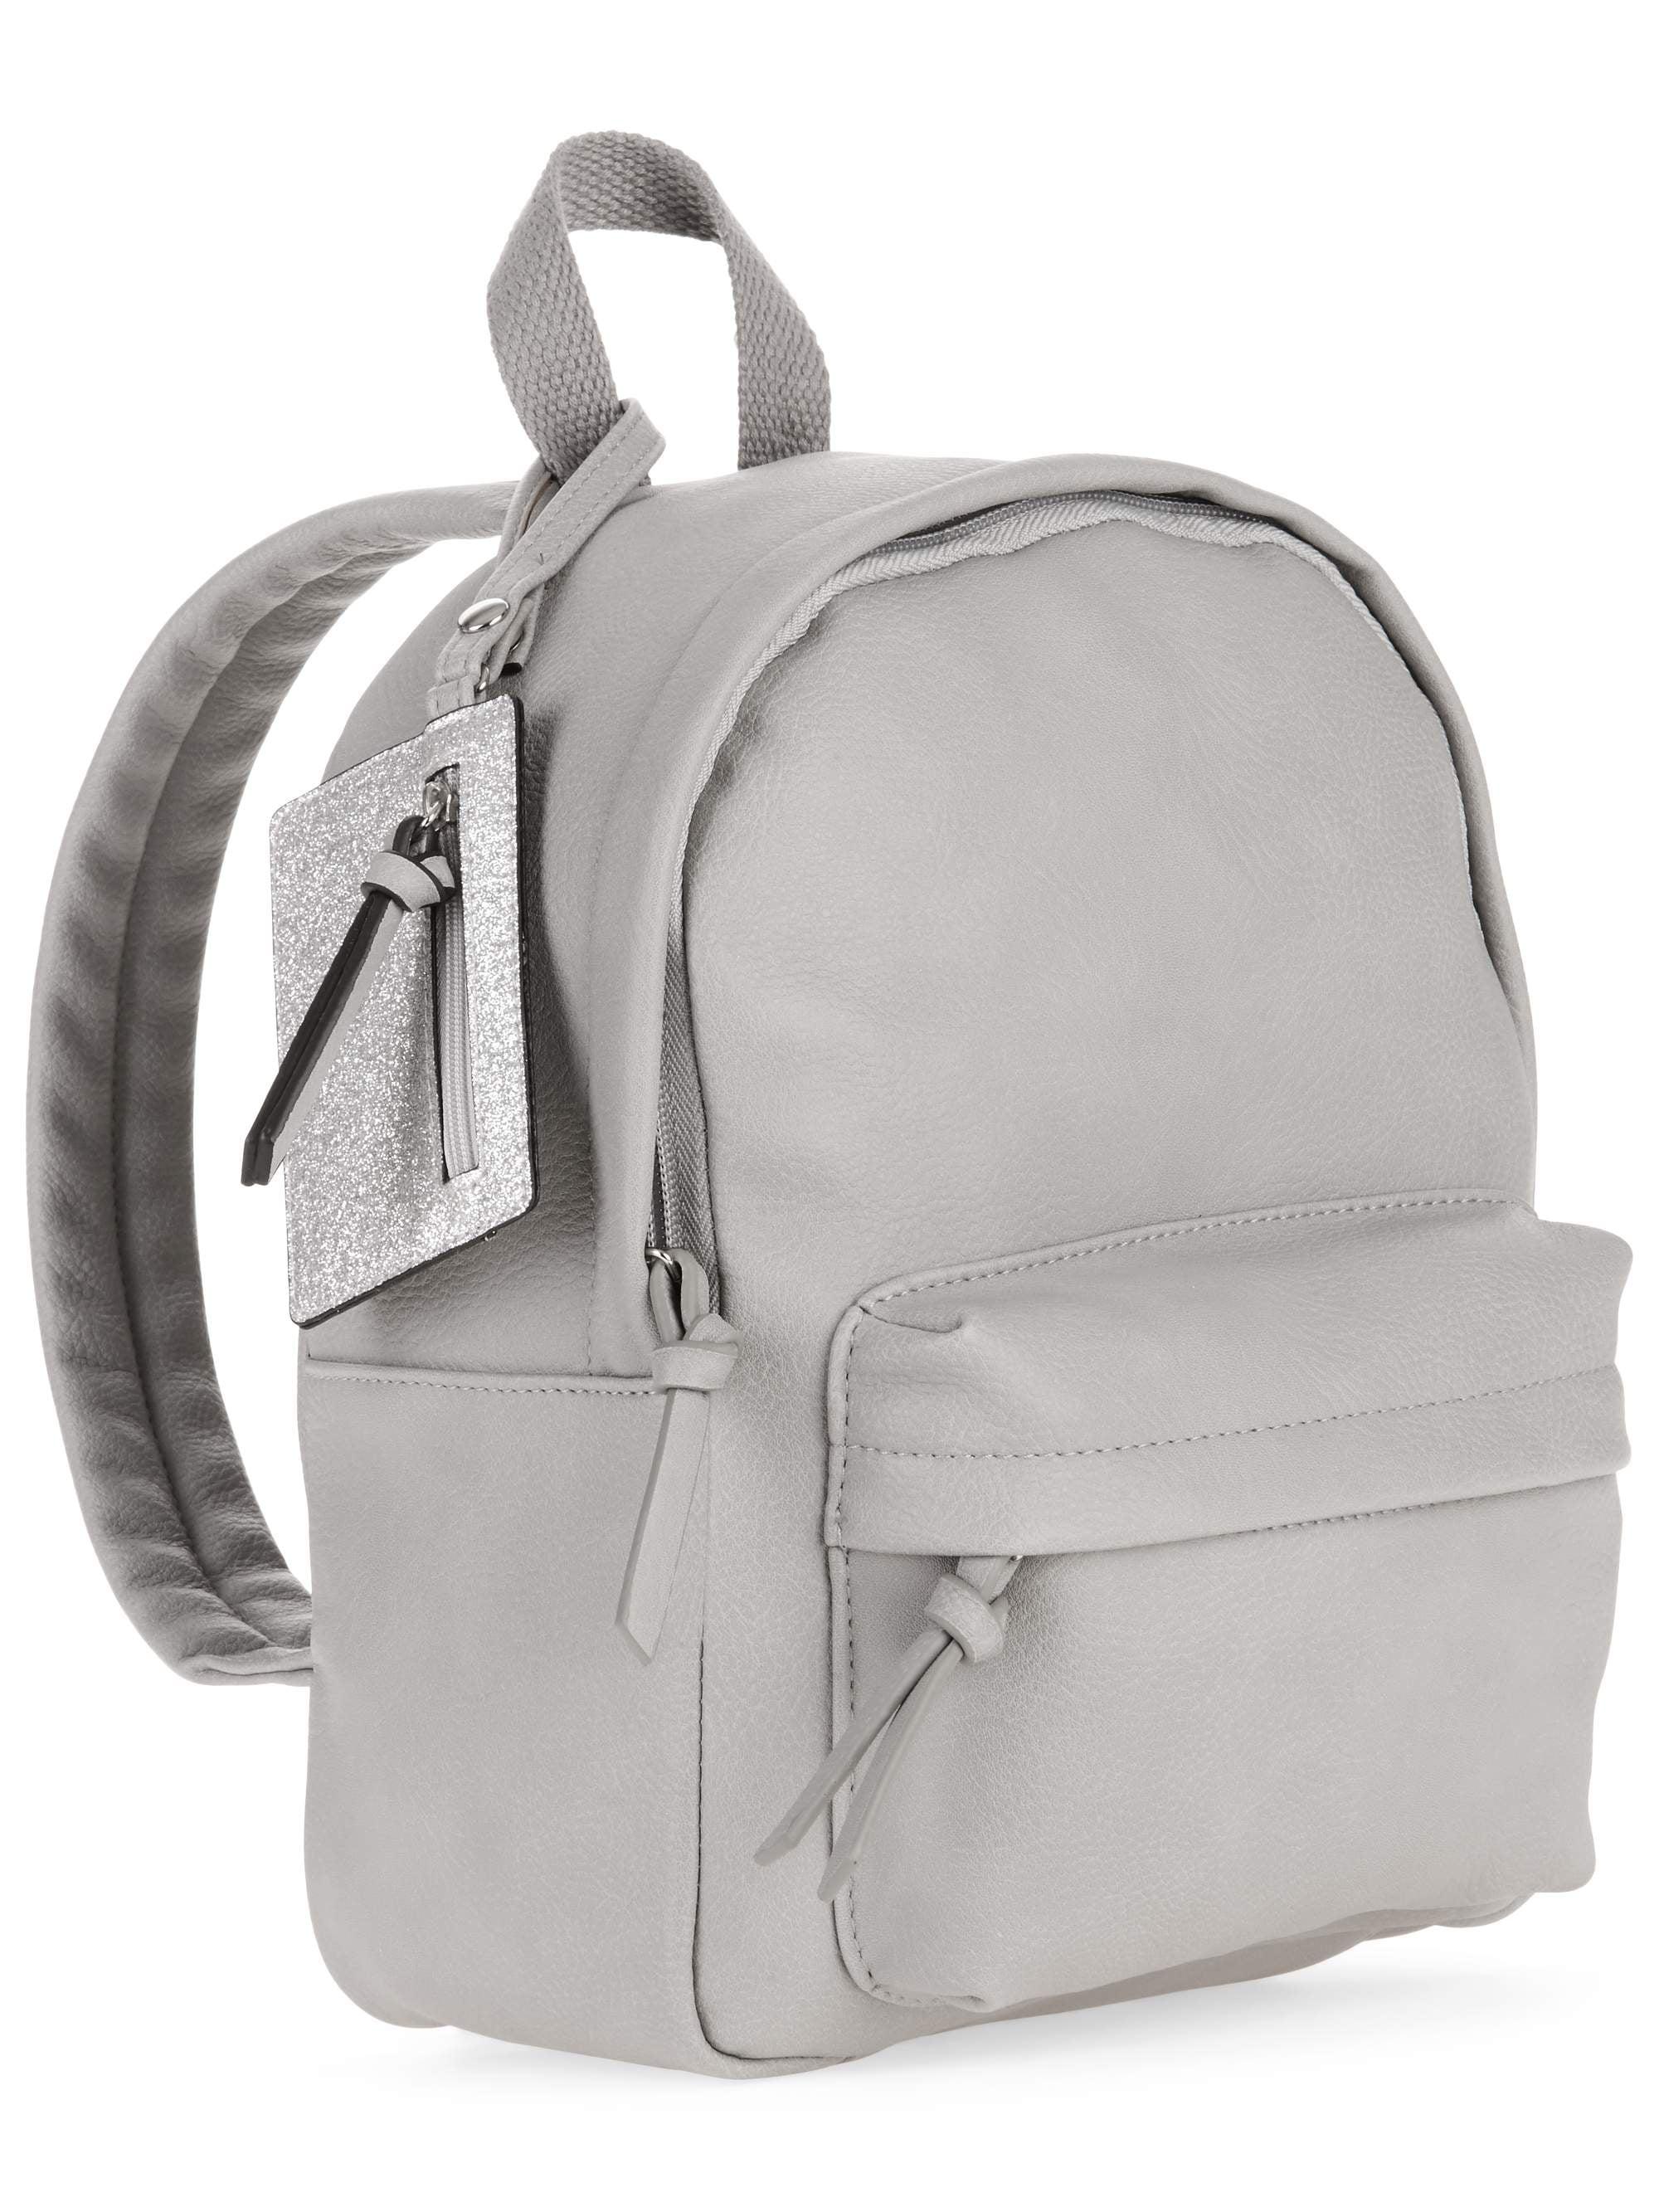 ef14cfc3003a No Boundaries Mini Backpack – Walmart Inventory Checker – BrickSeek